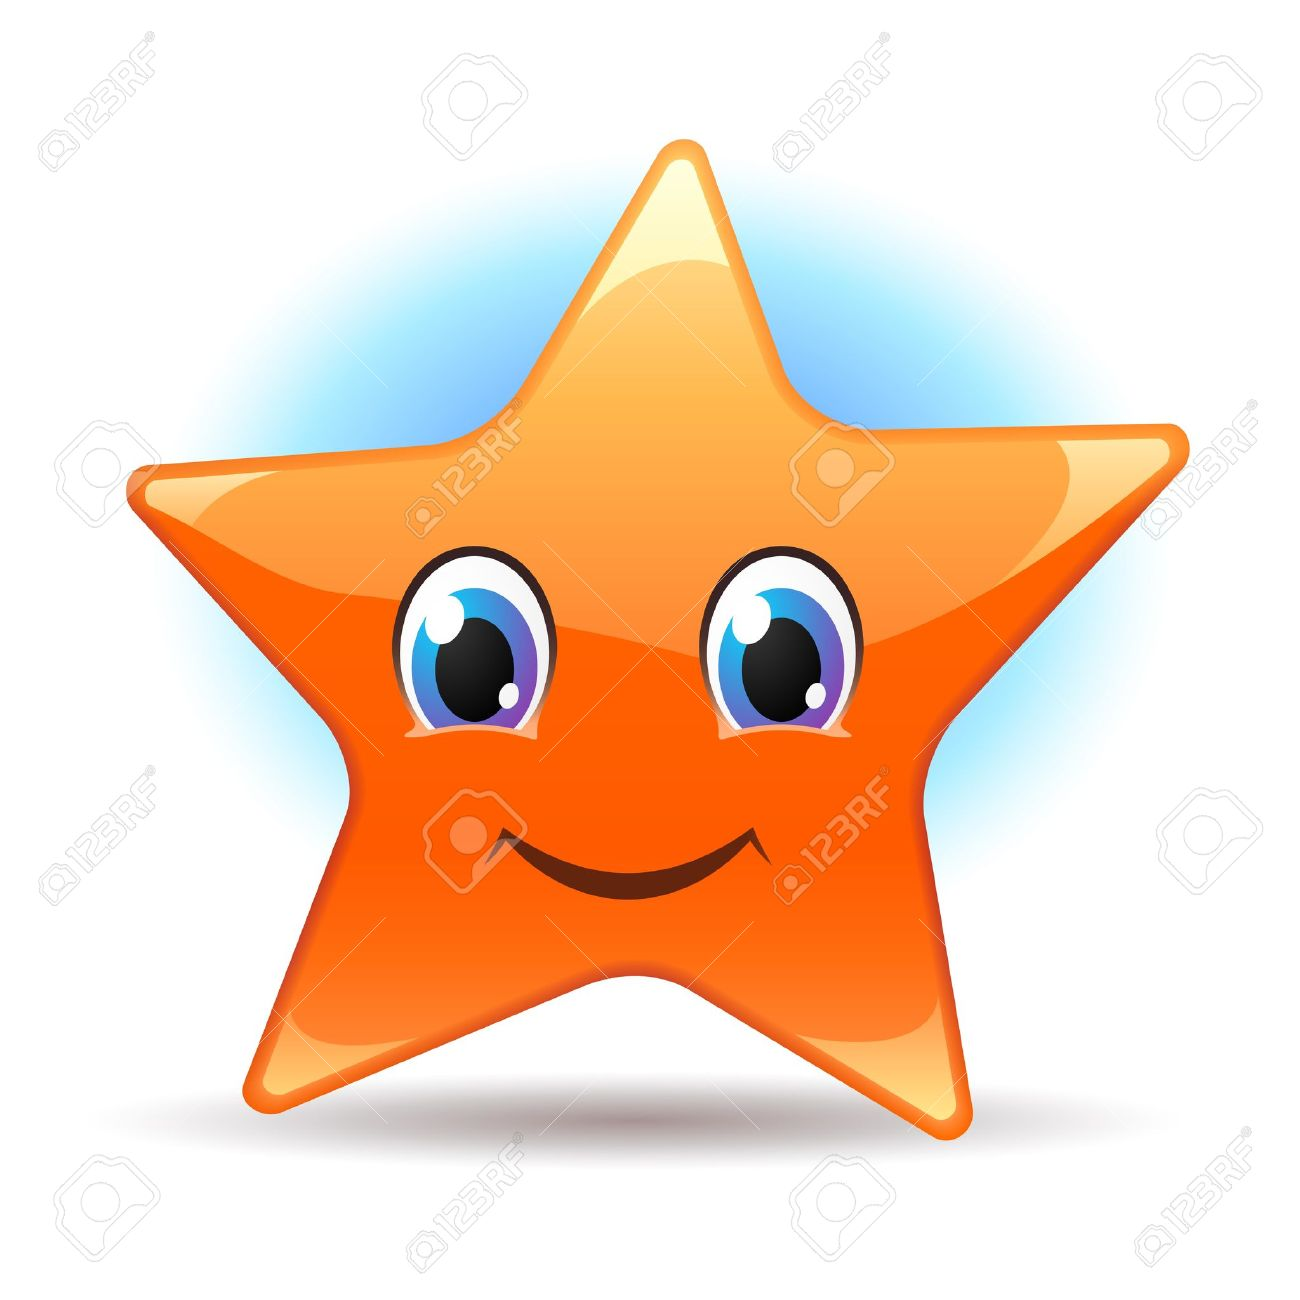 Smiley star Stock Vector - 9514831